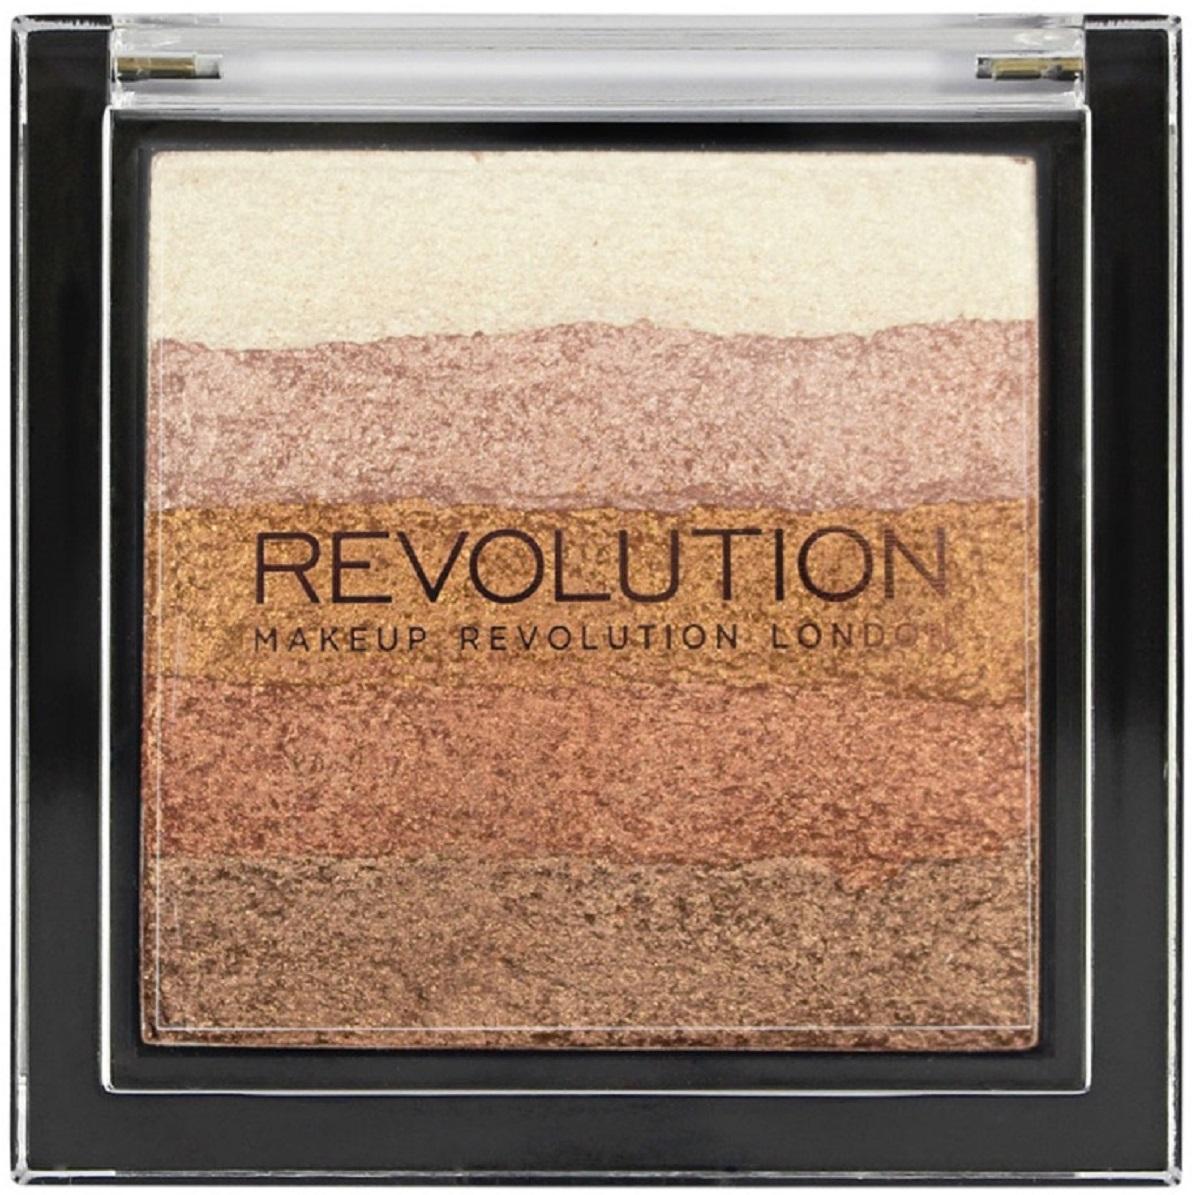 Makeup Revolution Хайлайтер Vivid Shimmer Brick Bronze Kiss хайлайтер ultra strobe and light makeup revolution лицо